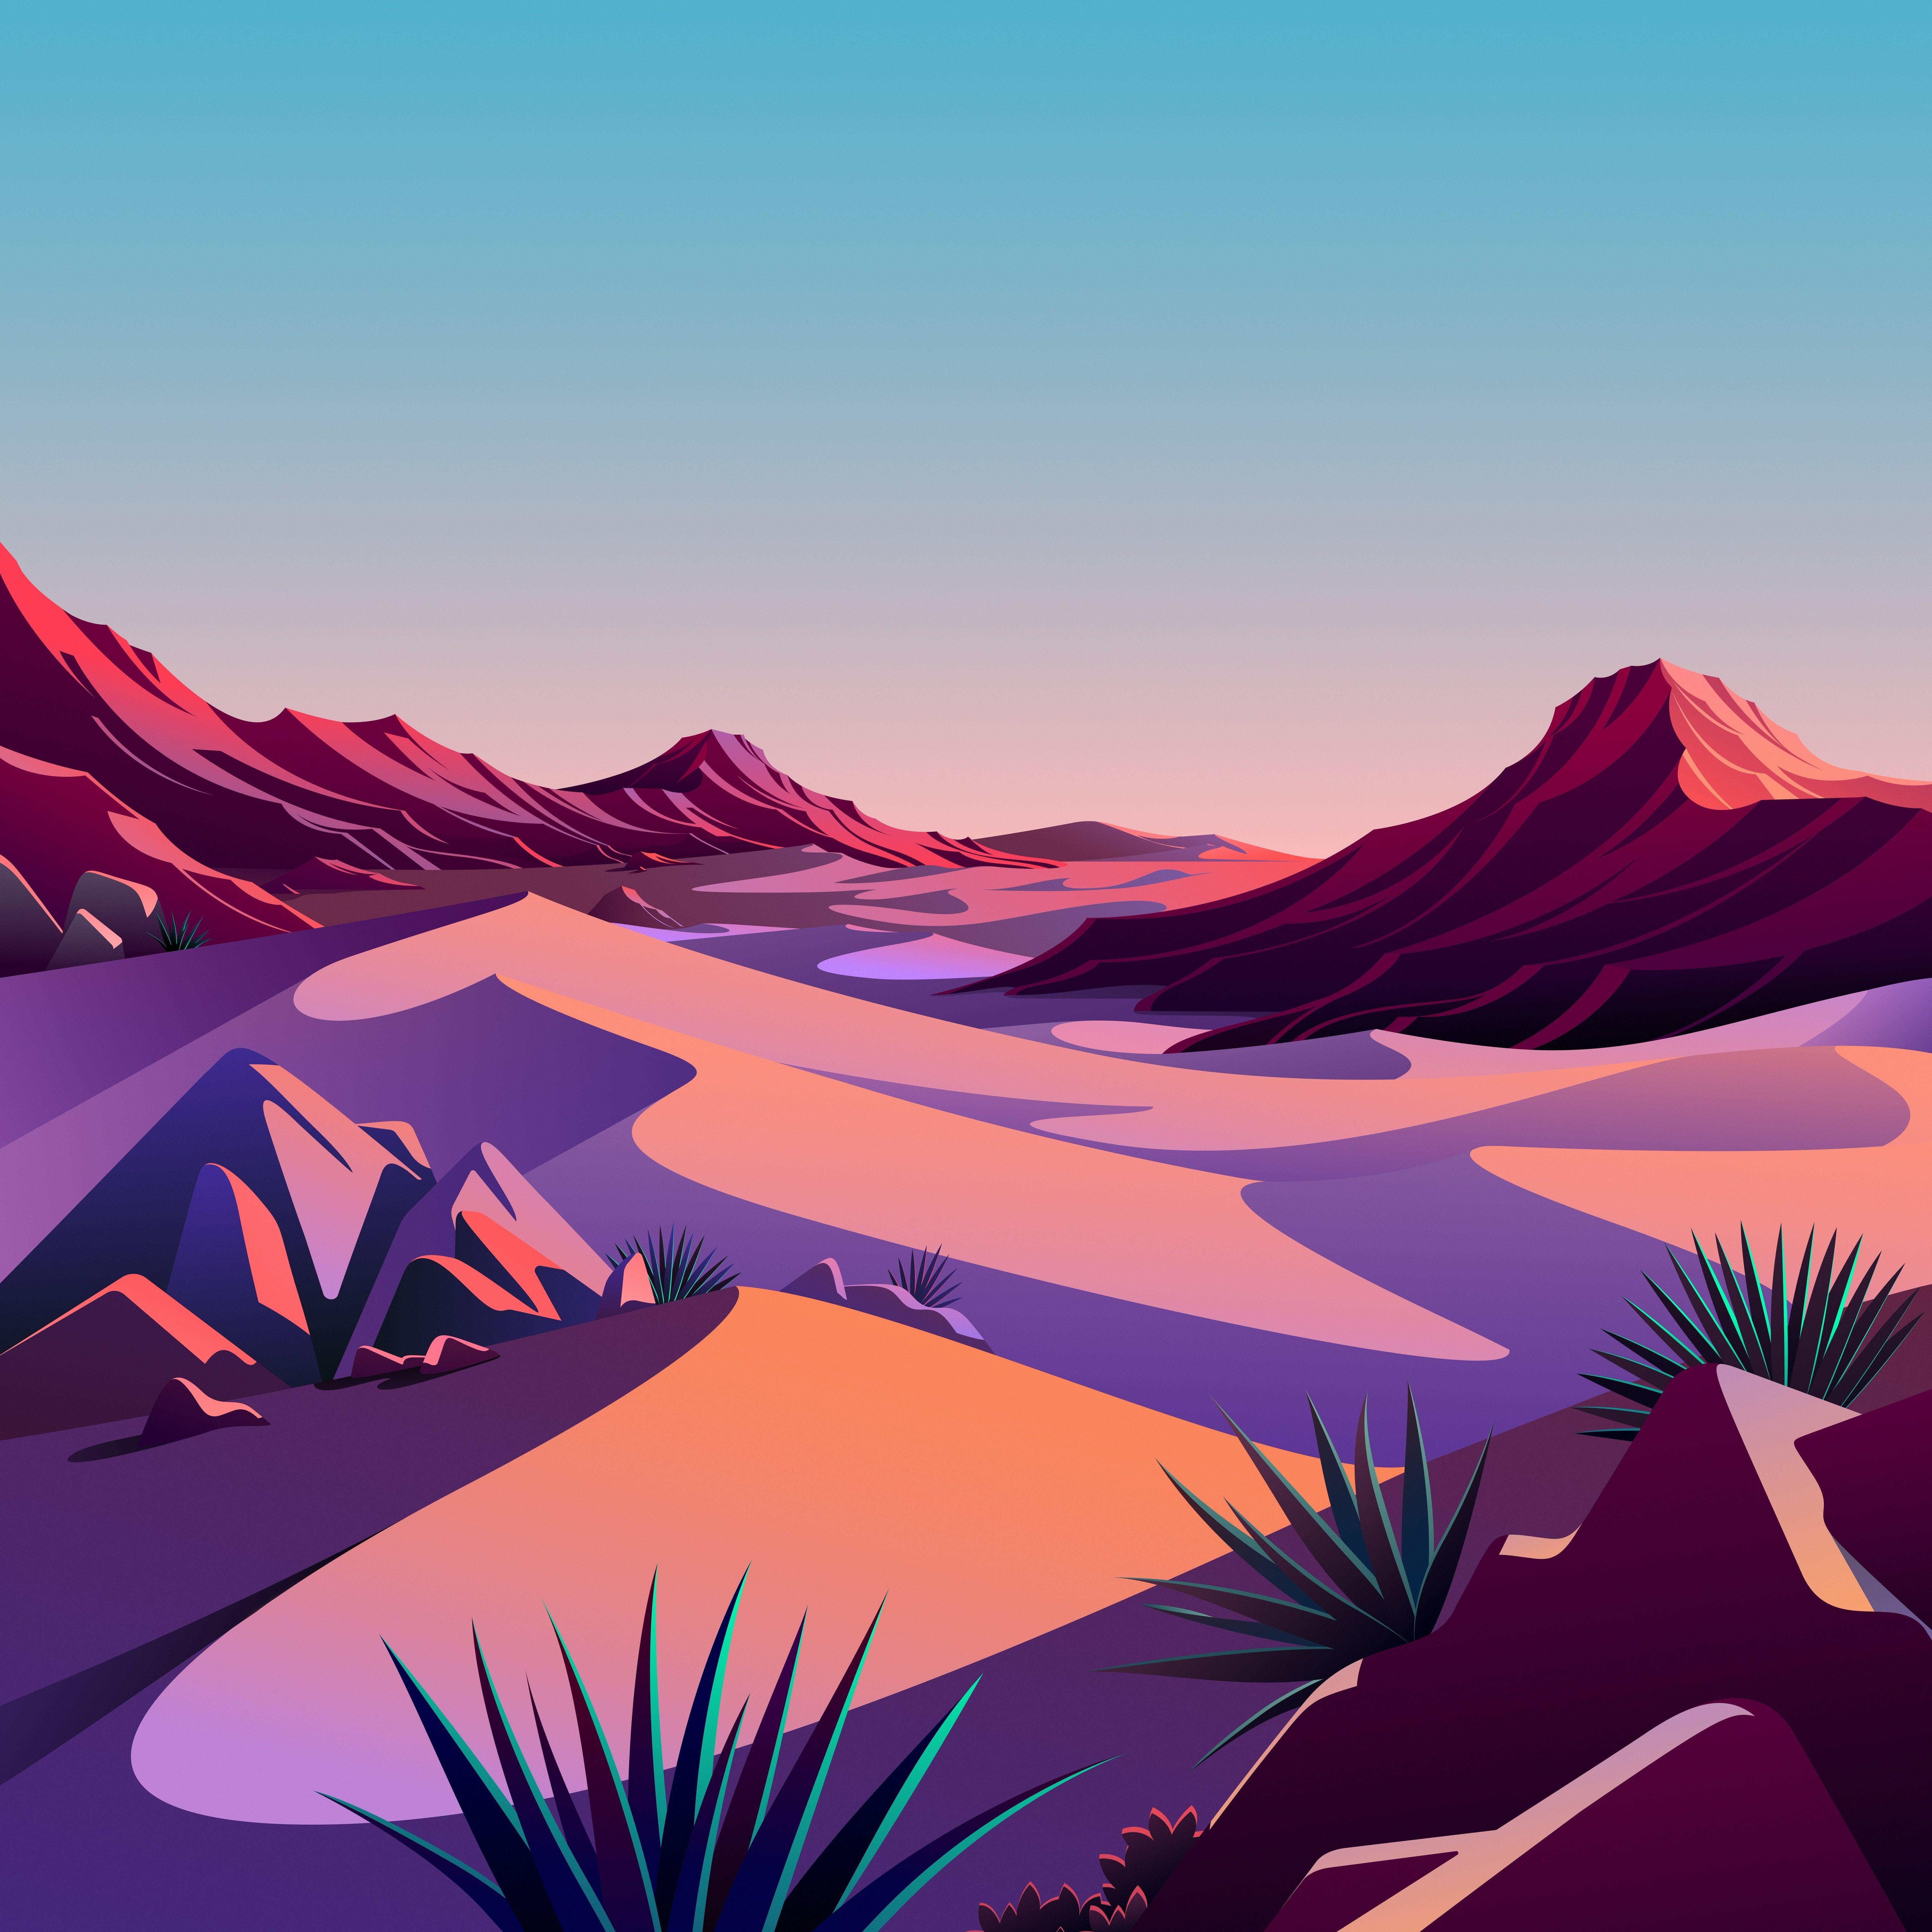 macOS Big Sur The Desert 1 dragged